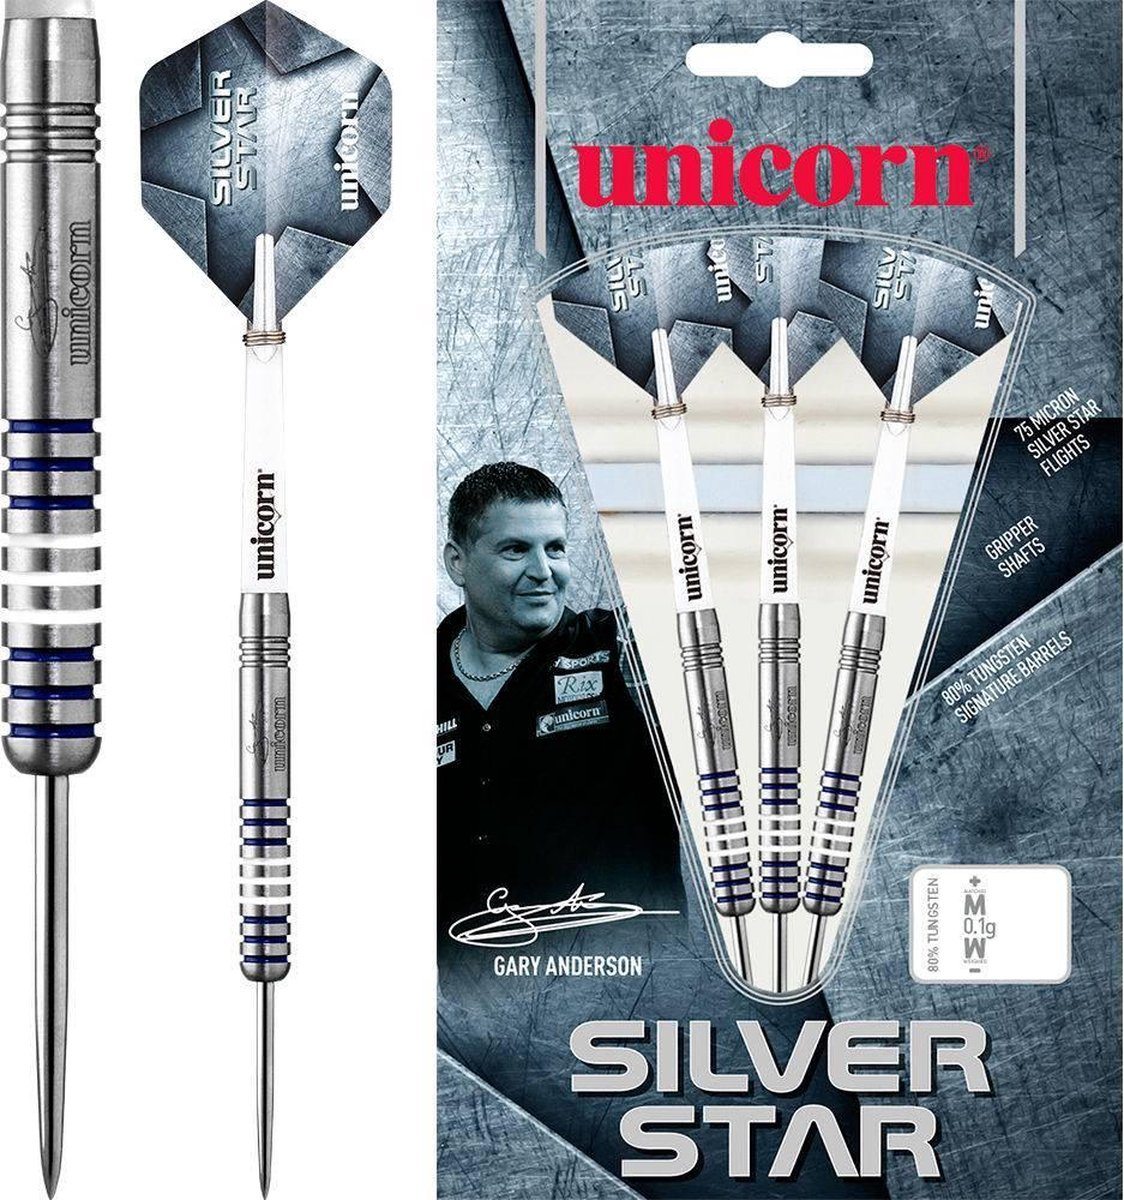 Unicorn Gary Anderson Silverstar 80% P1 - 23 Gram